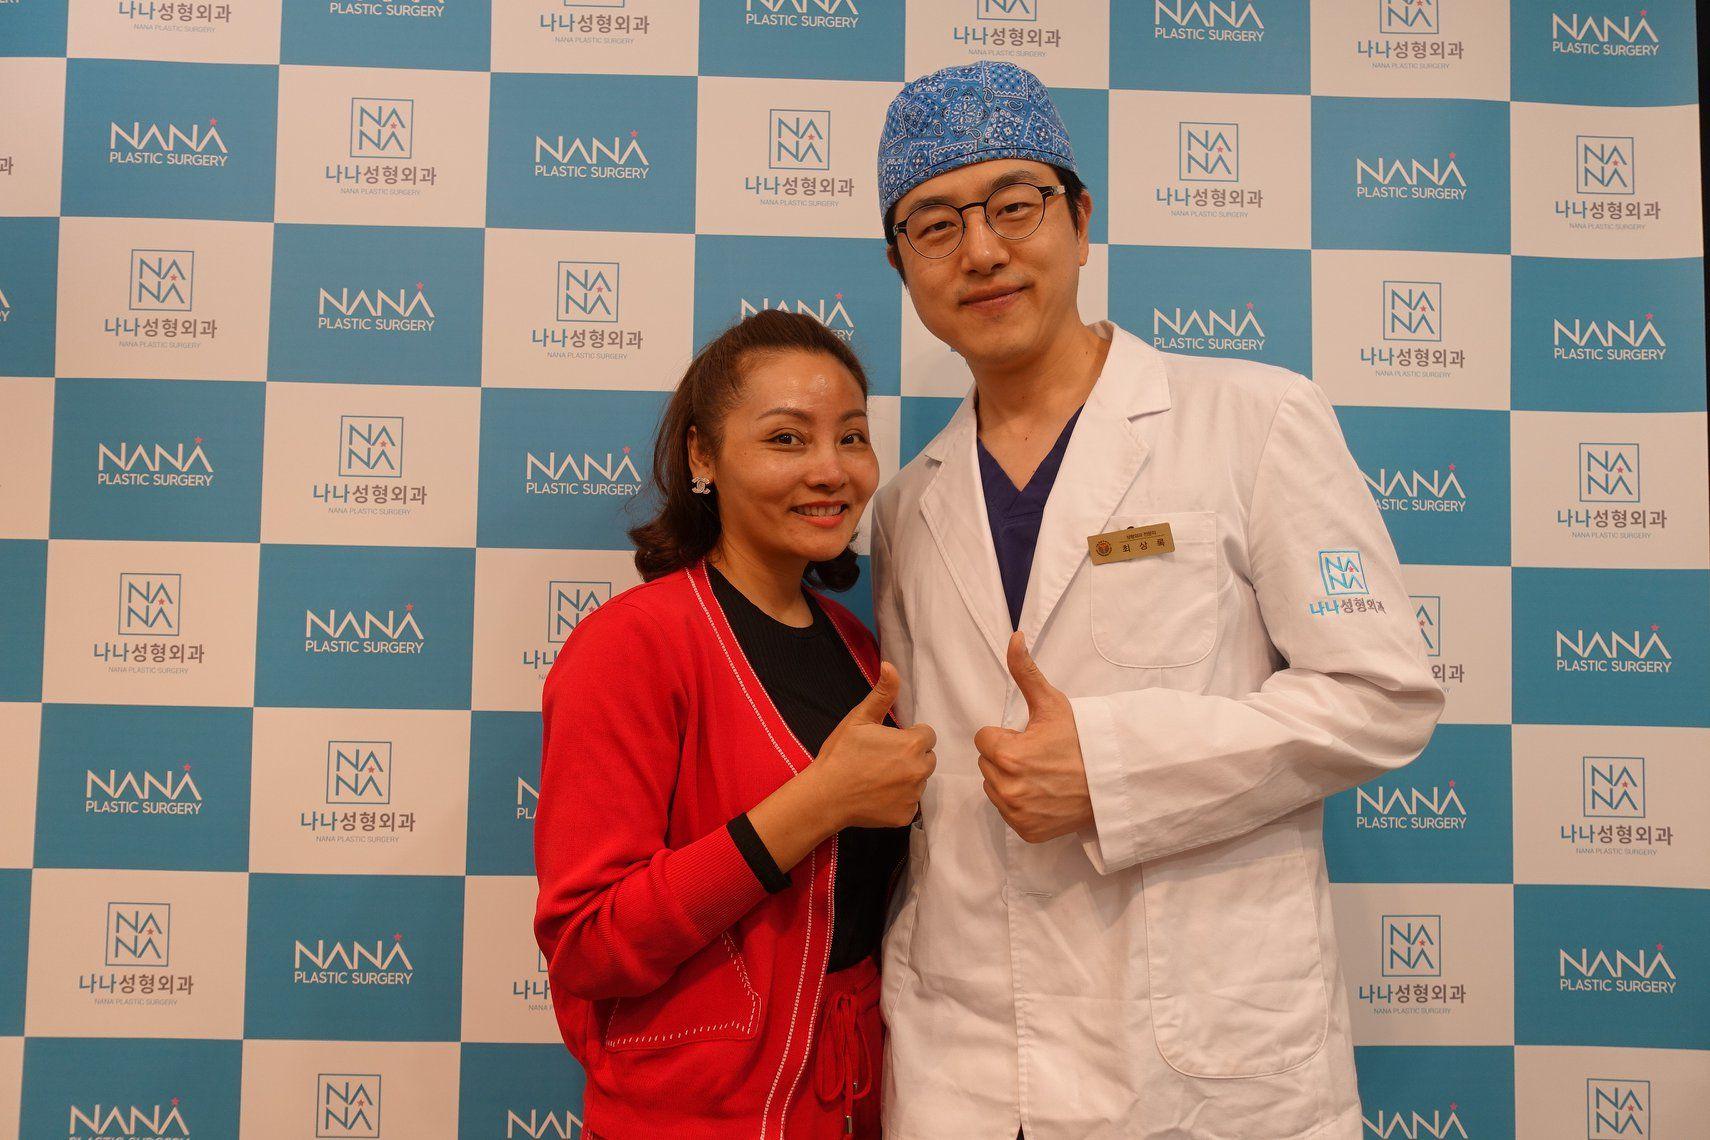 Nana Plastic Surgery Hospital